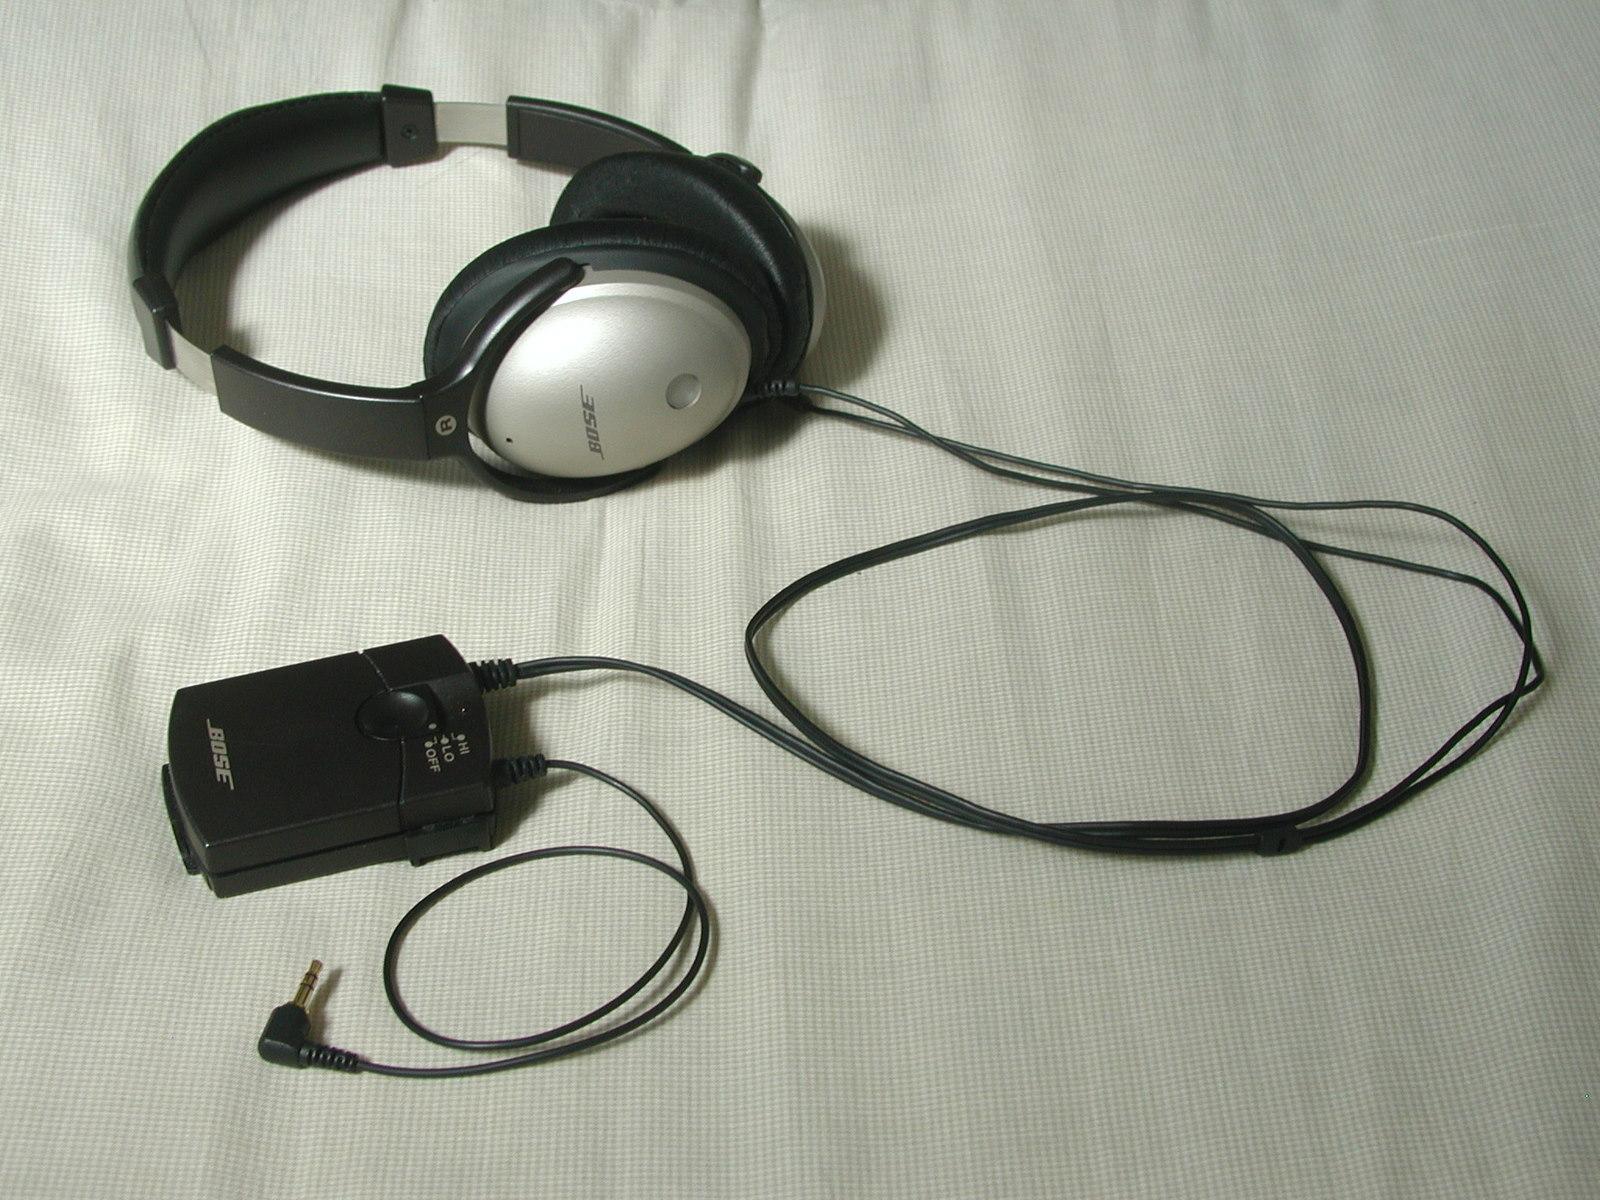 Elementary School Headphones Have in Elementary School